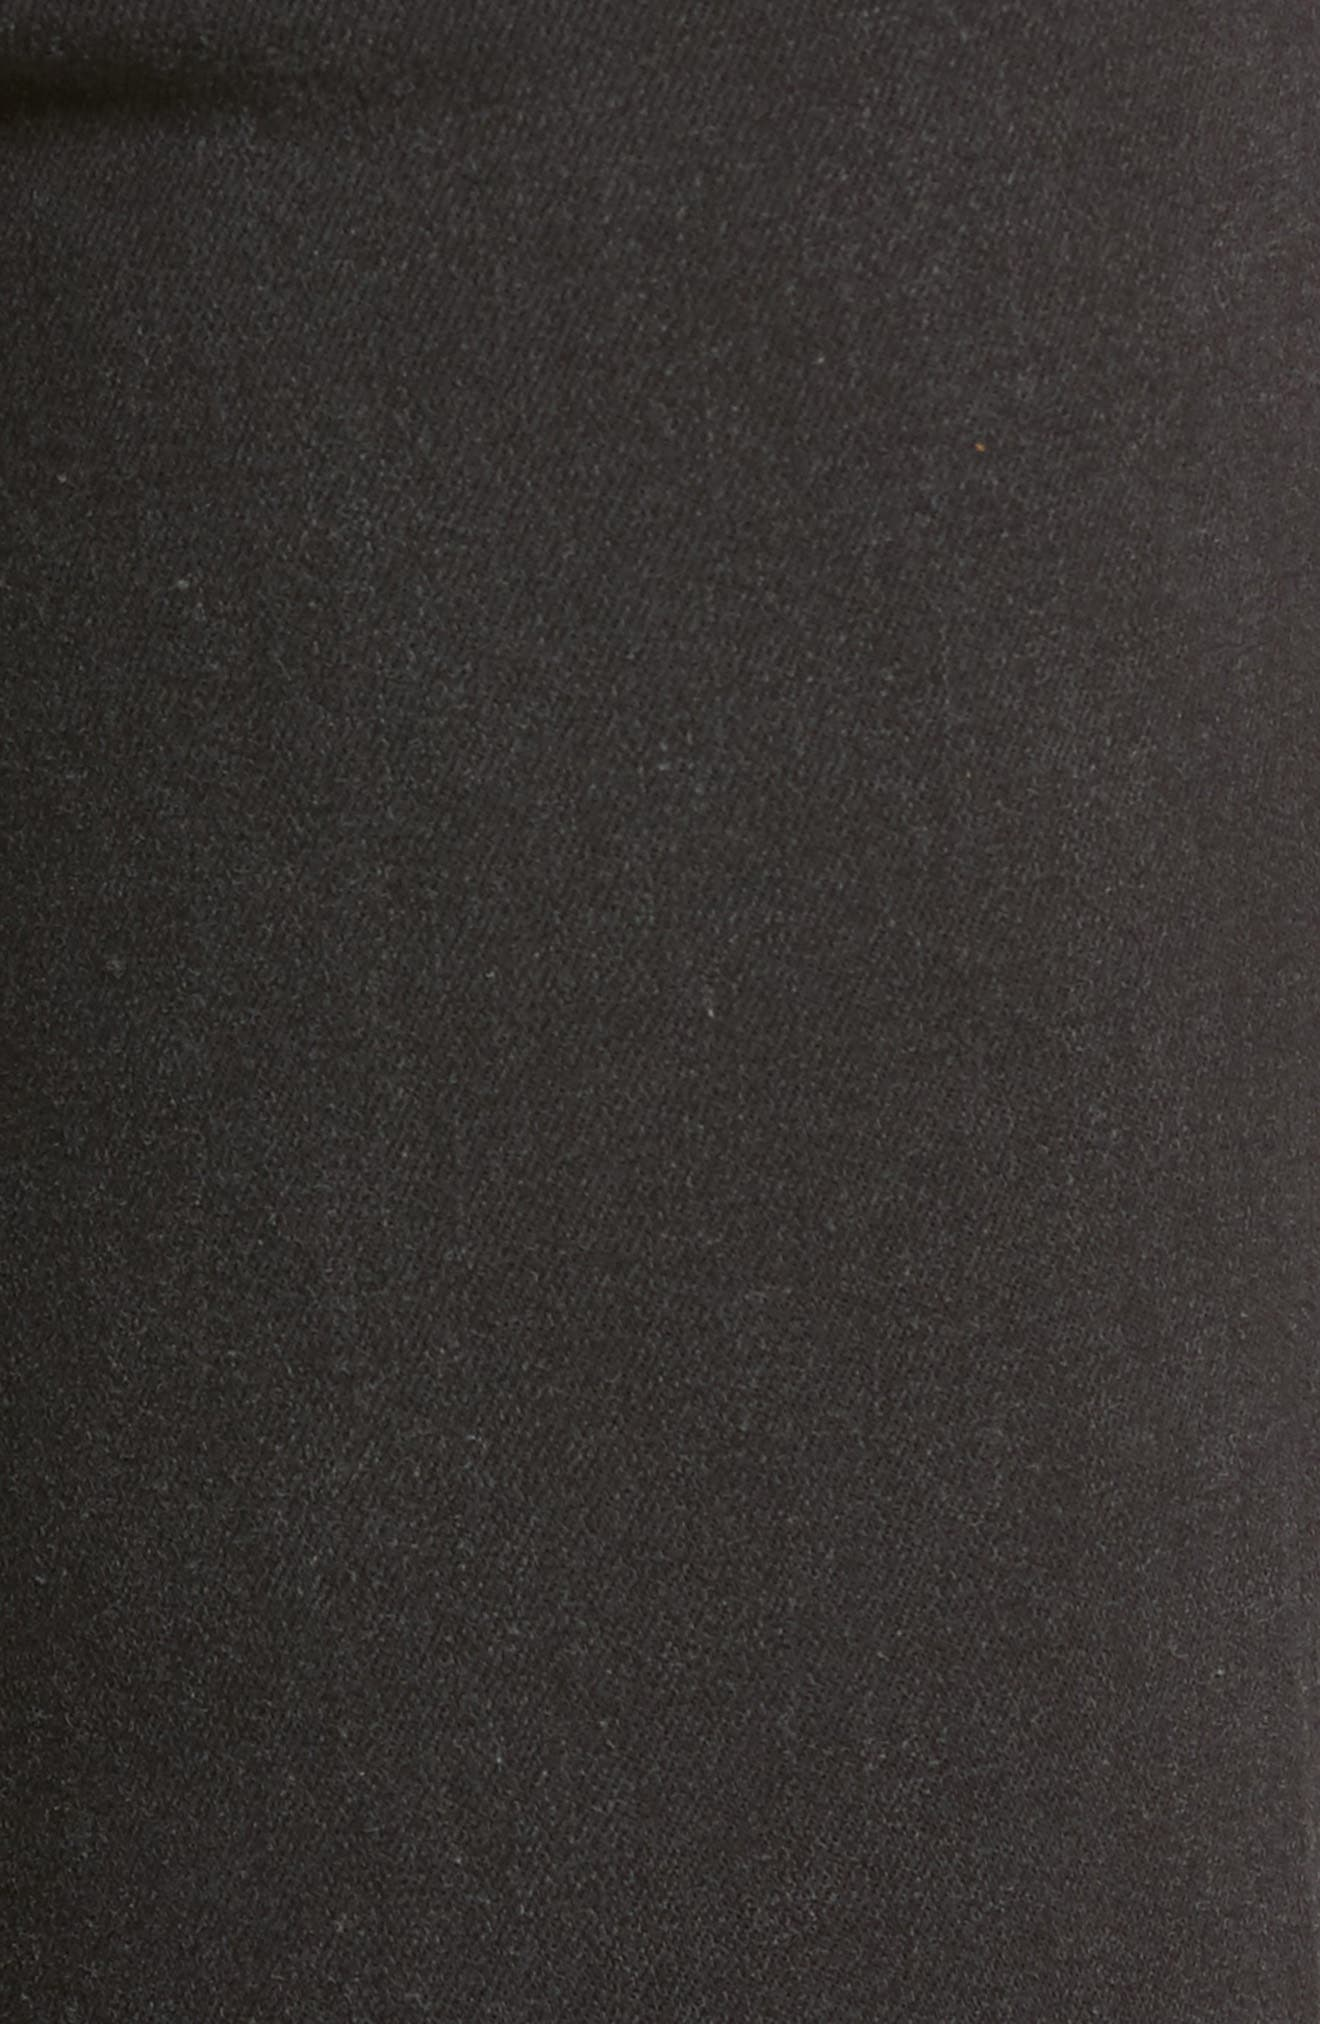 Transcend - Margot High Waist Crop Ultra Skinny Jeans,                             Alternate thumbnail 6, color,                             001